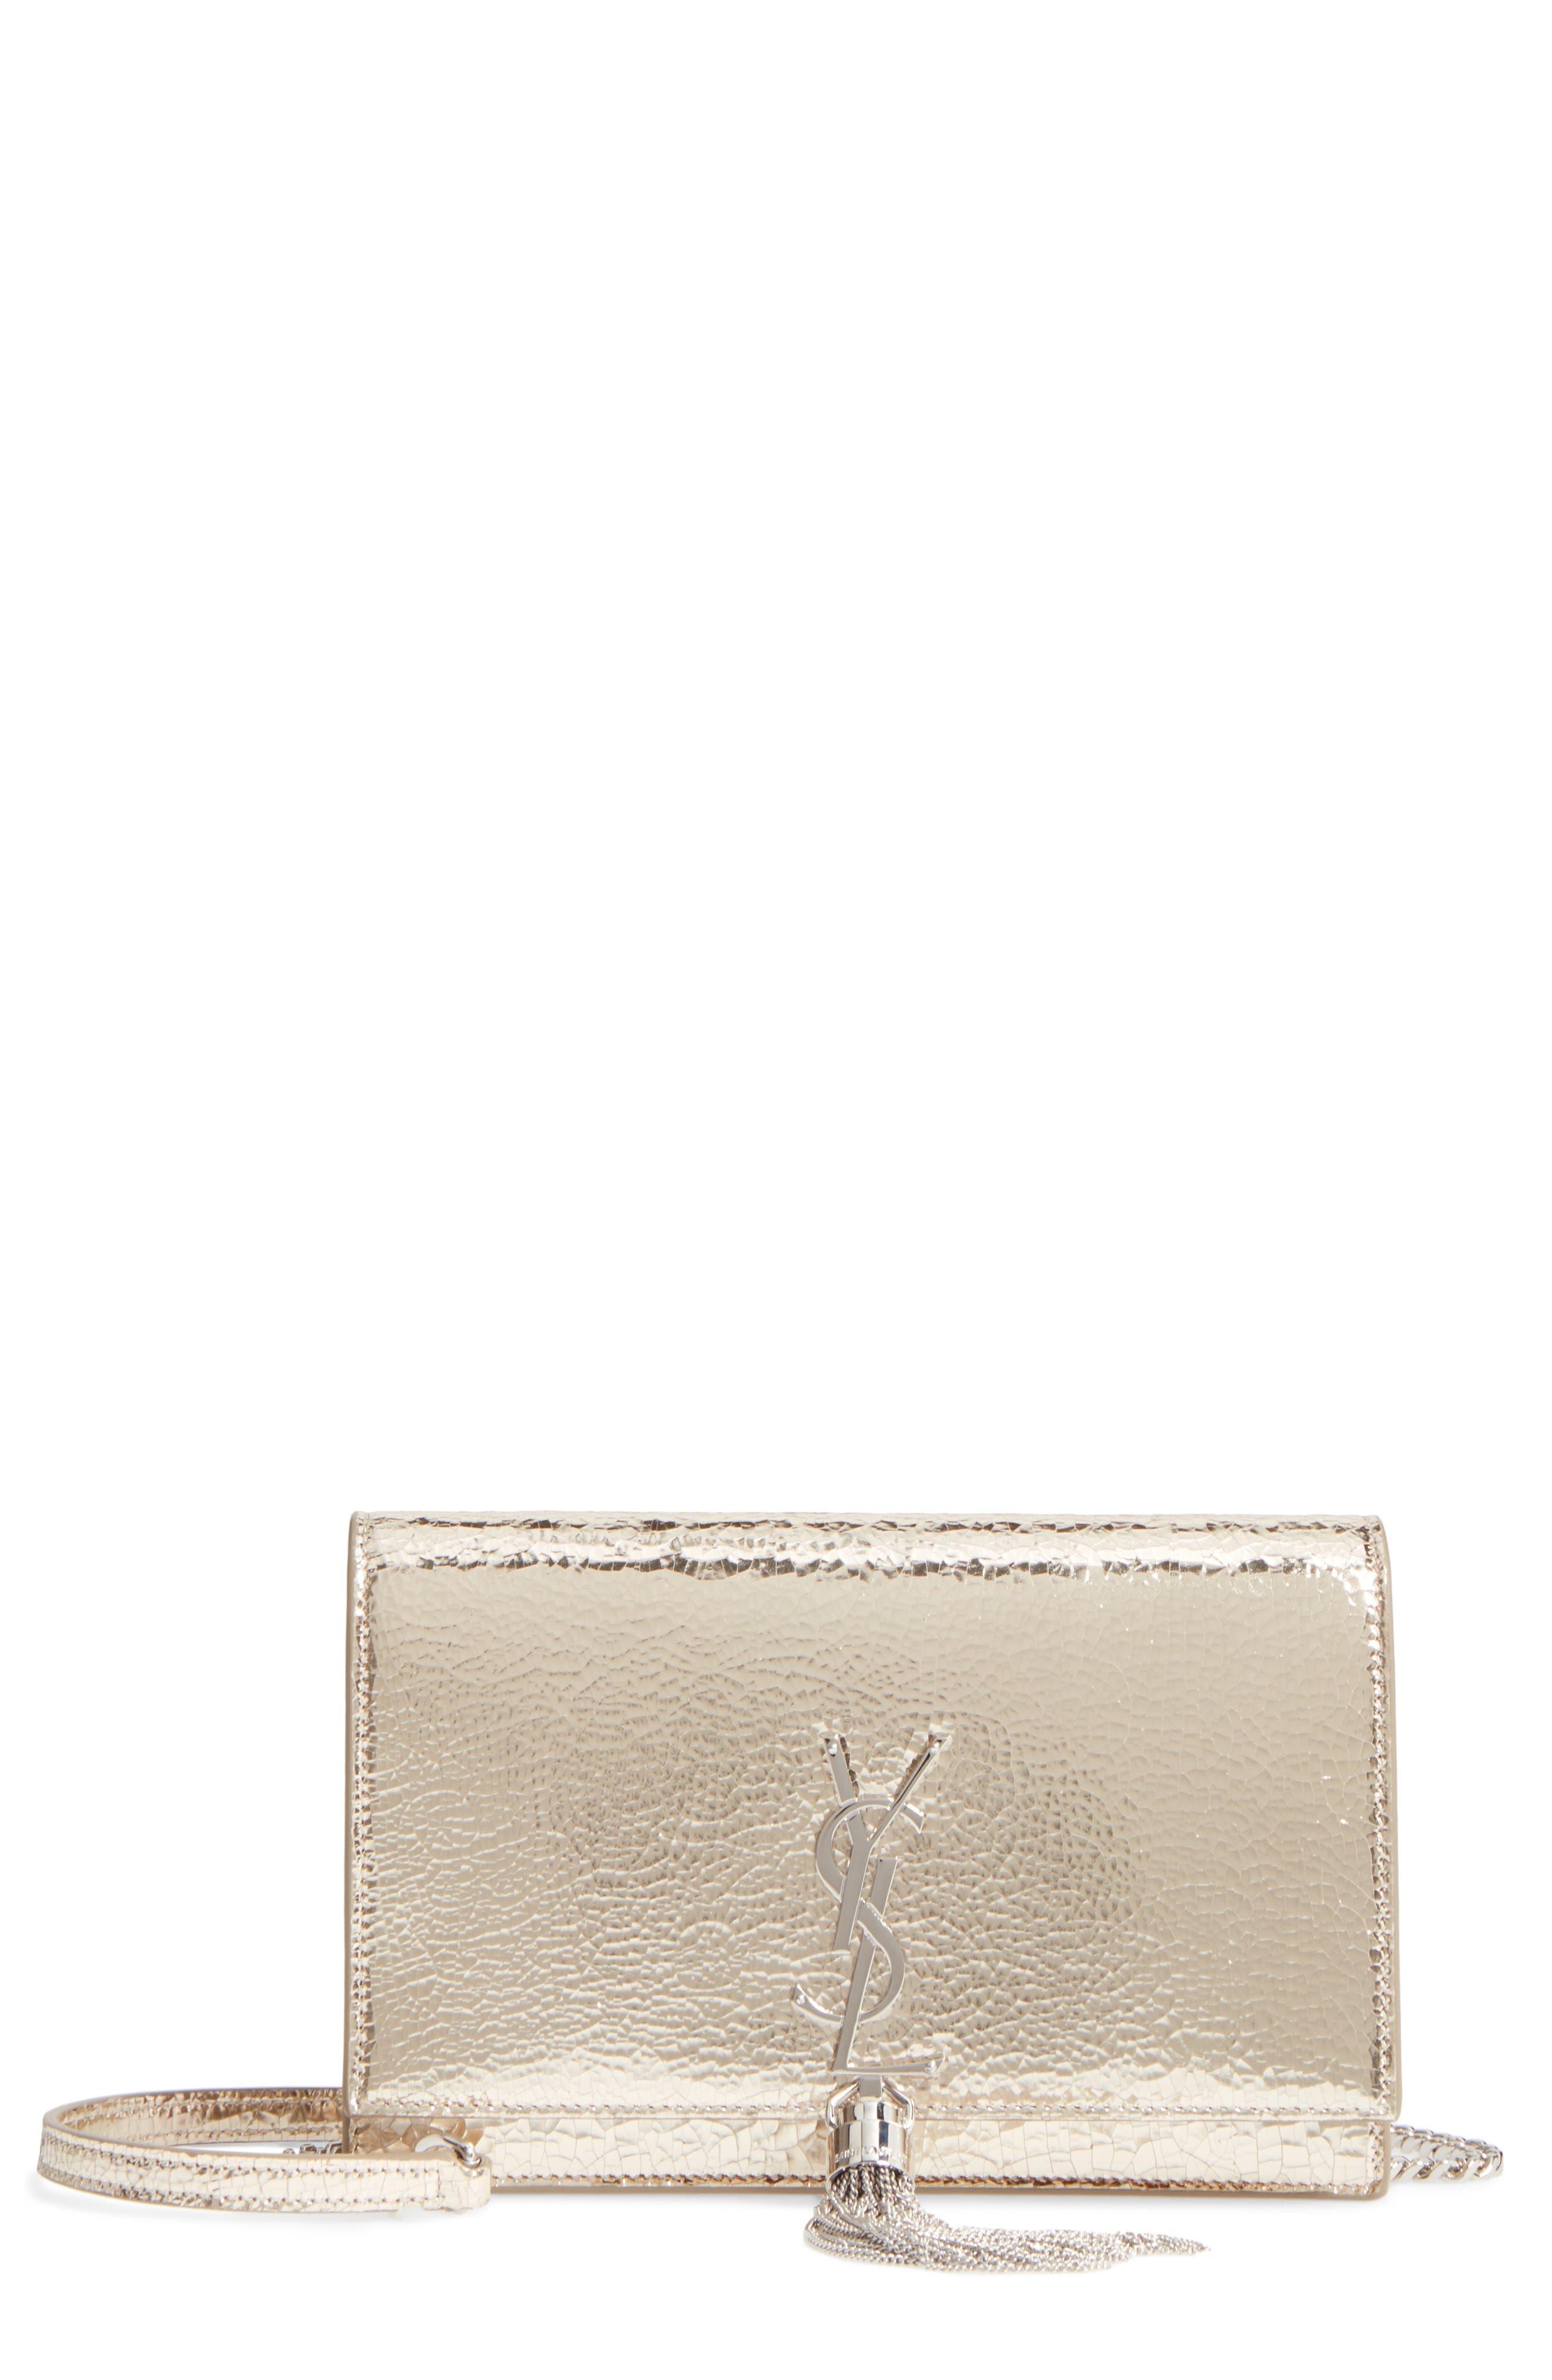 Saint Laurent Kate Crackle Calfskin Wallet on a Chain